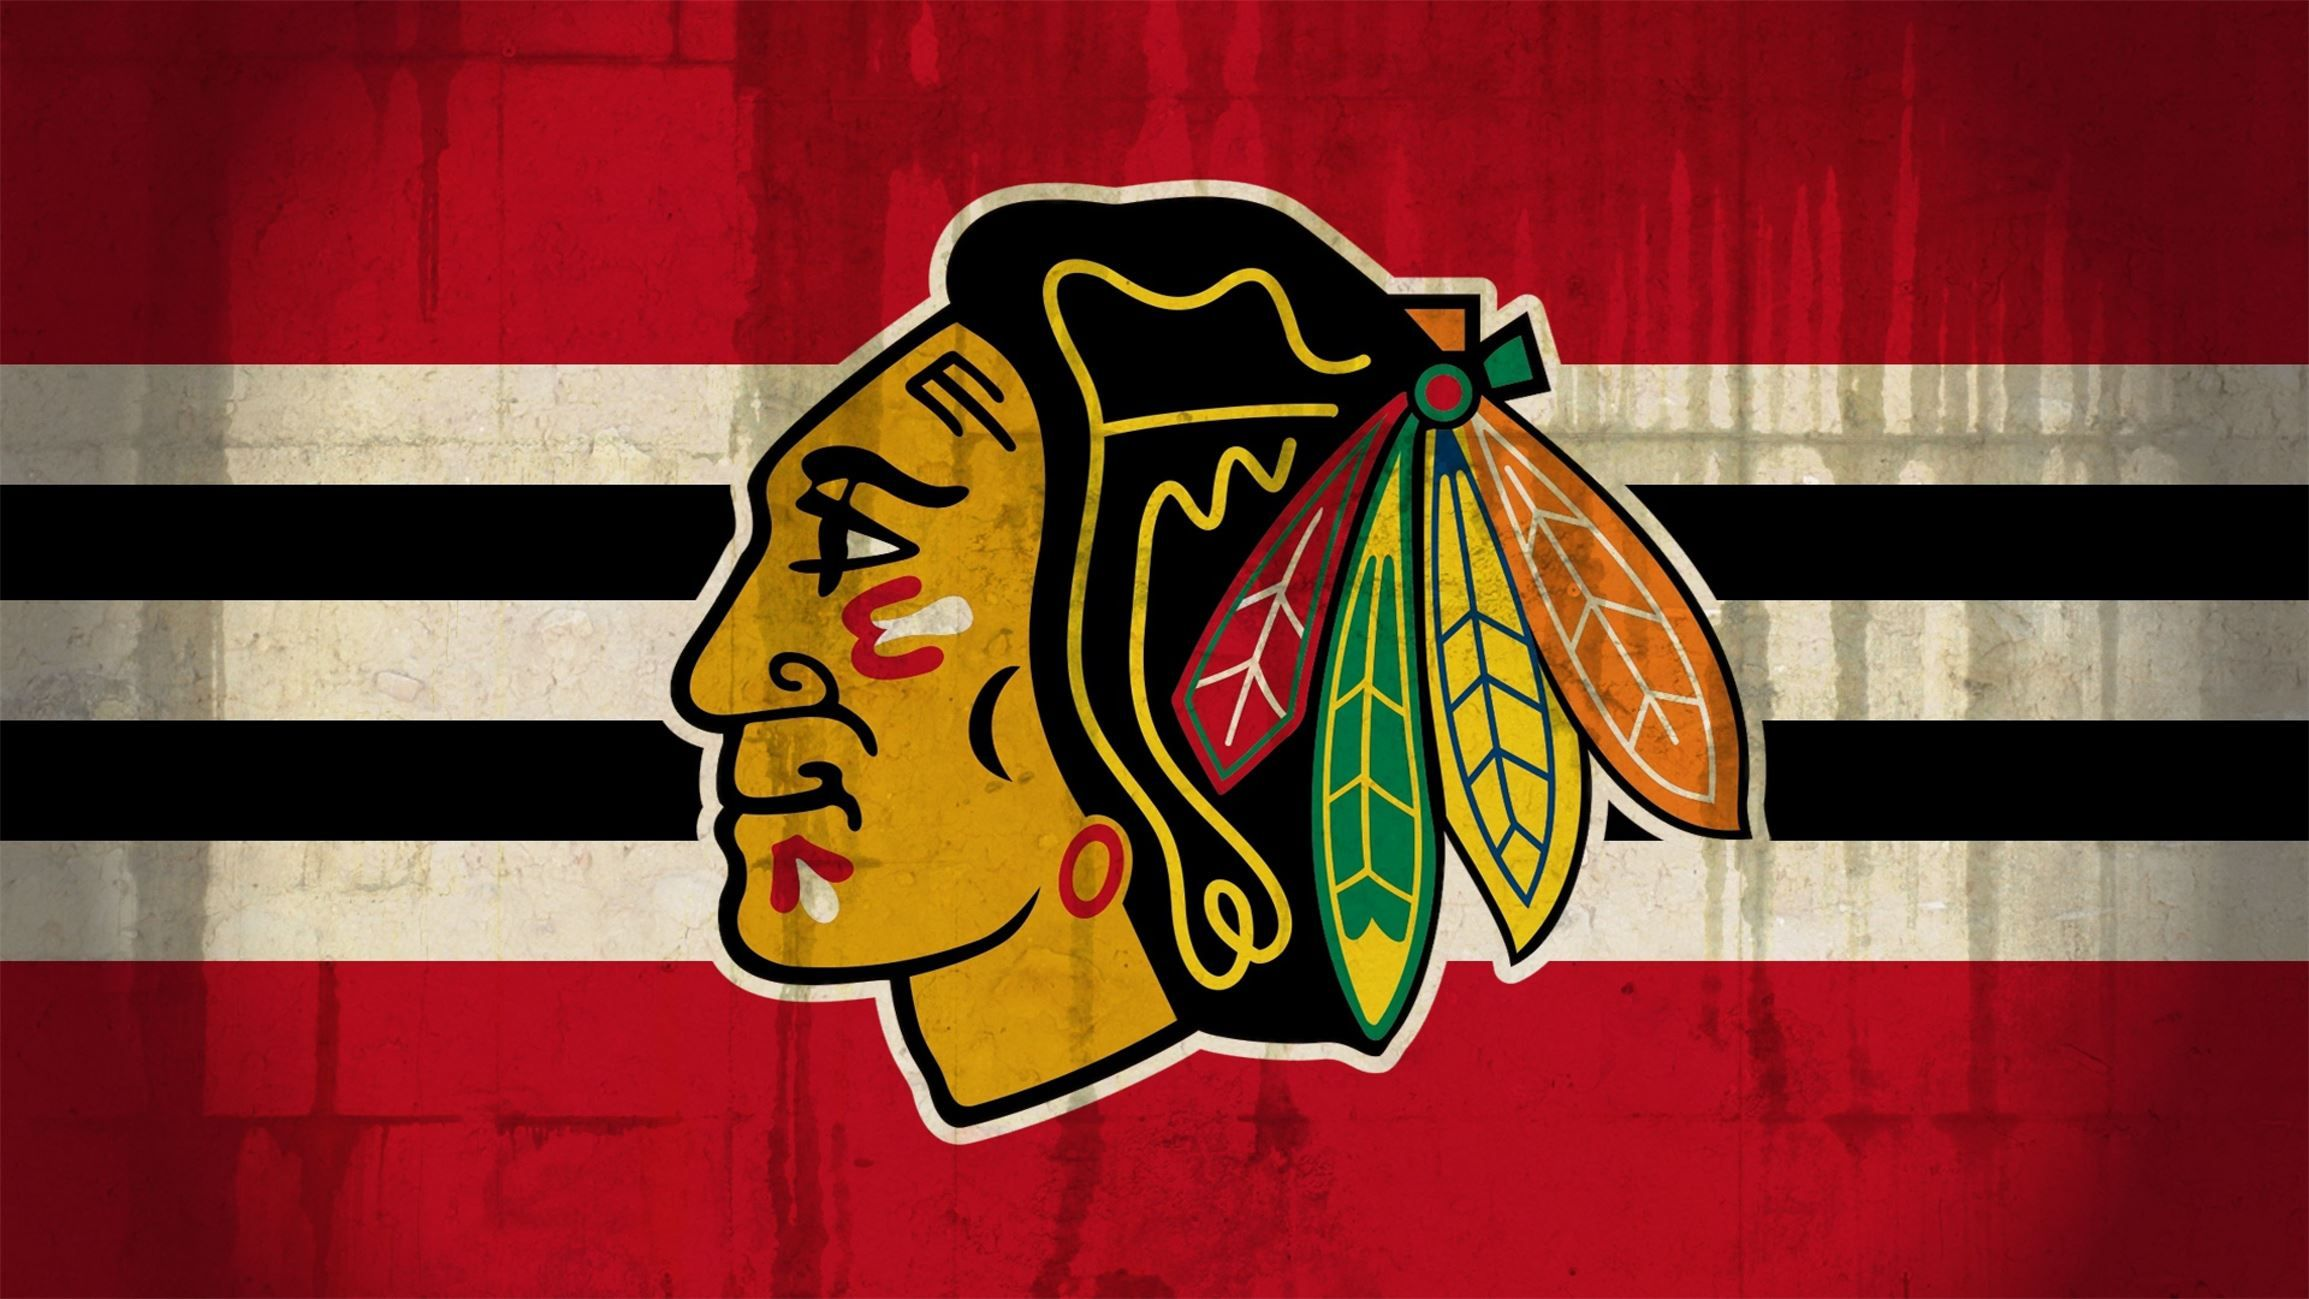 Chicago Blackhawks Uhd Wallpaper Chicago Blackhawks Wallpaper Chicago Blackhawks Logo Nhl Blackhawks